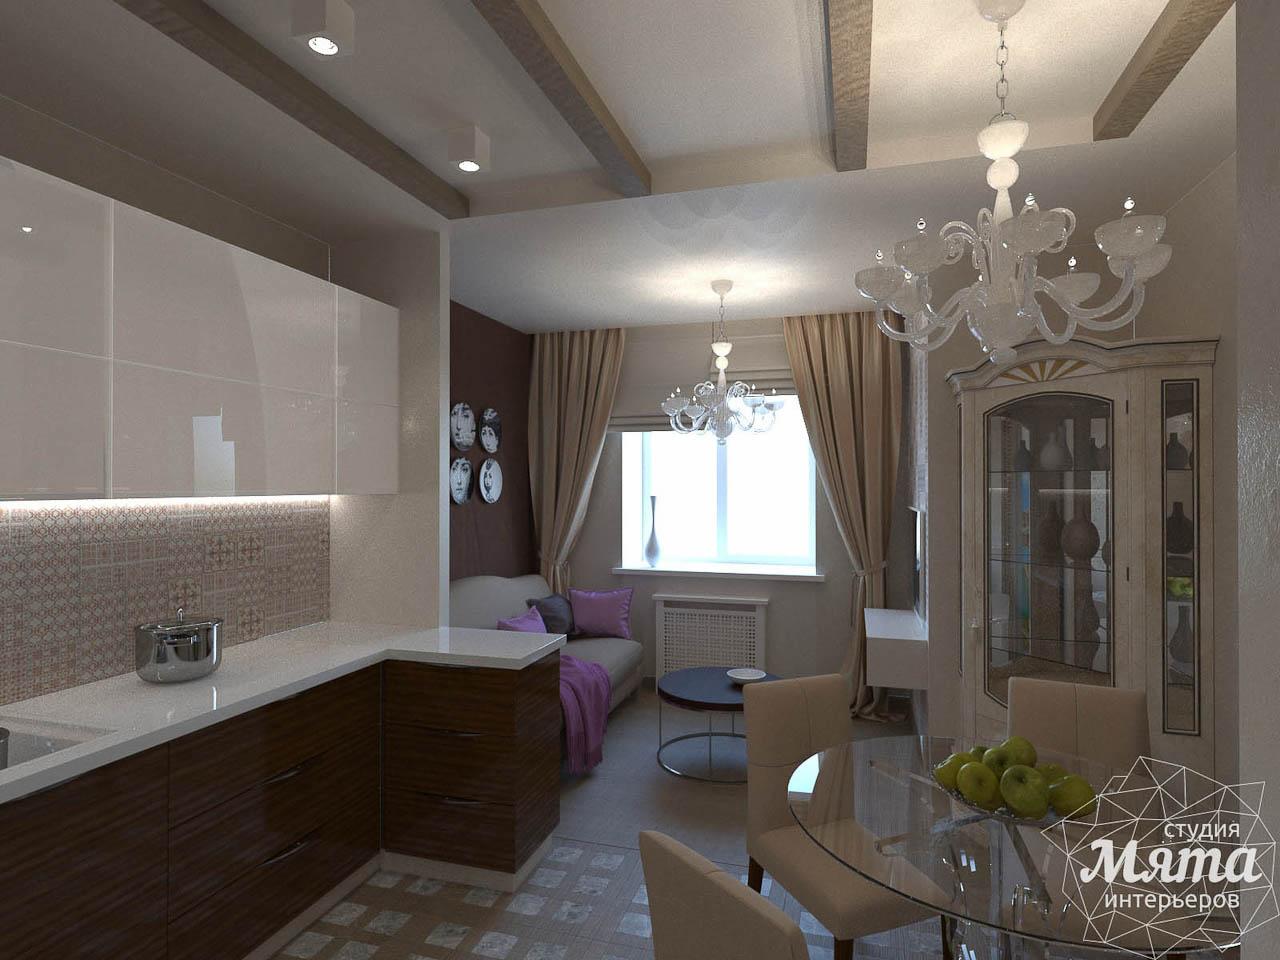 Дизайн интерьера трехкомнатной квартиры по ул. Мельникова 27 img291463126